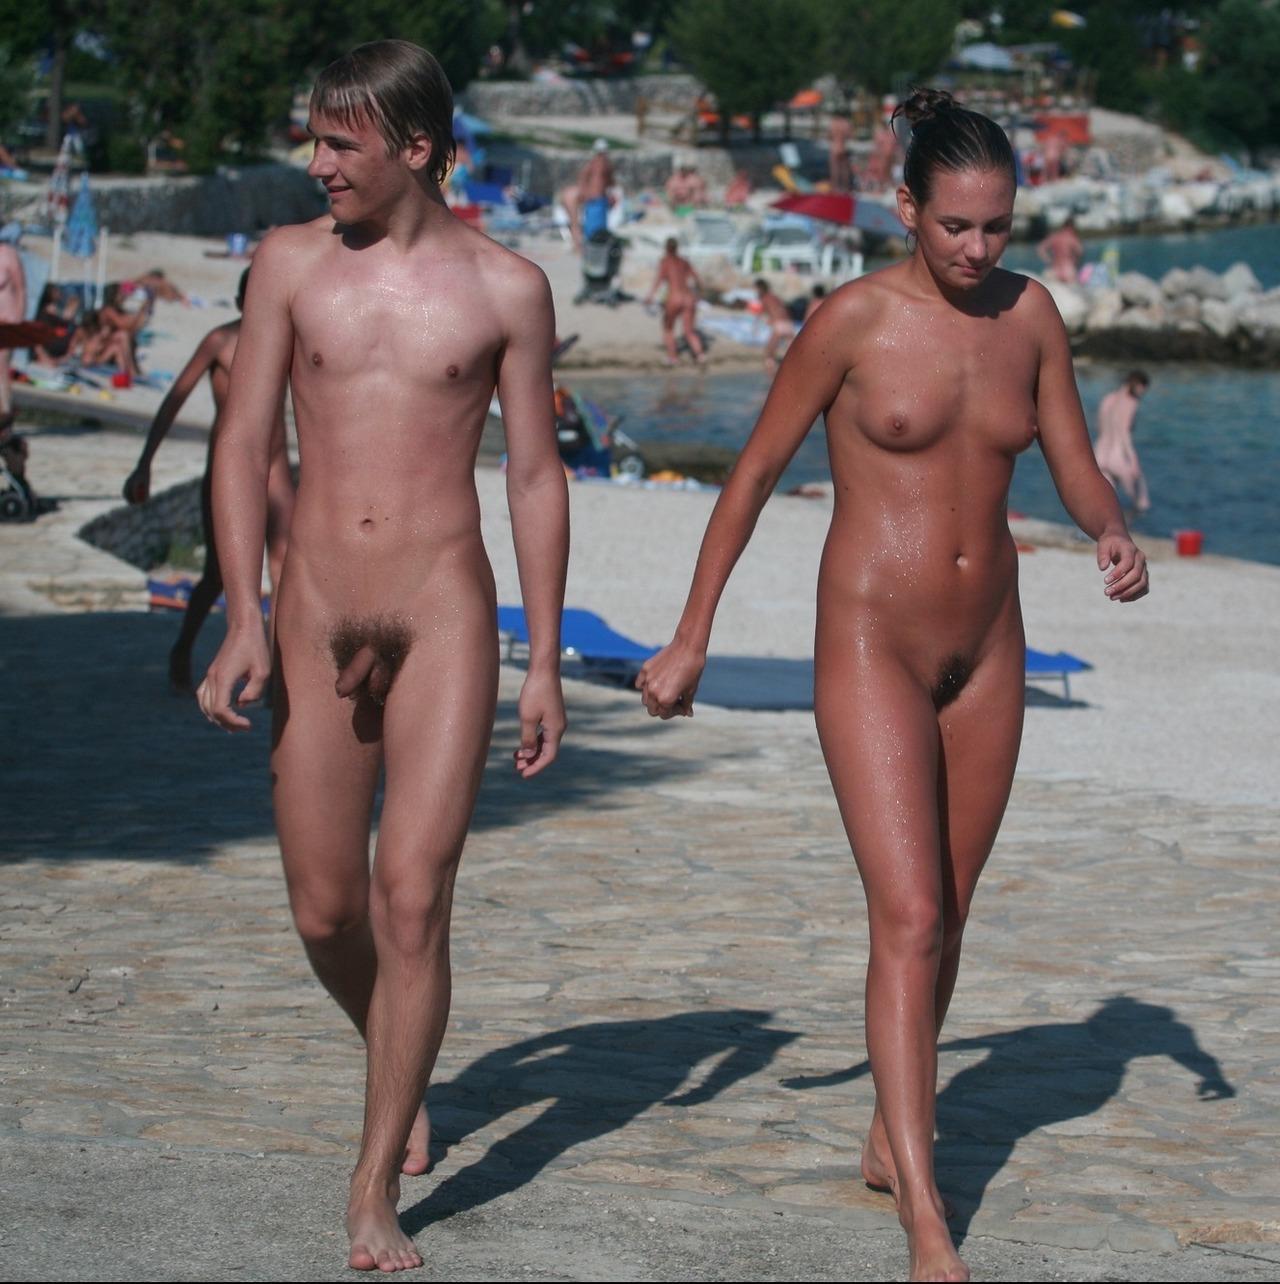 Gallery 1  Naked On The Beach  Nakedwalker200-6728